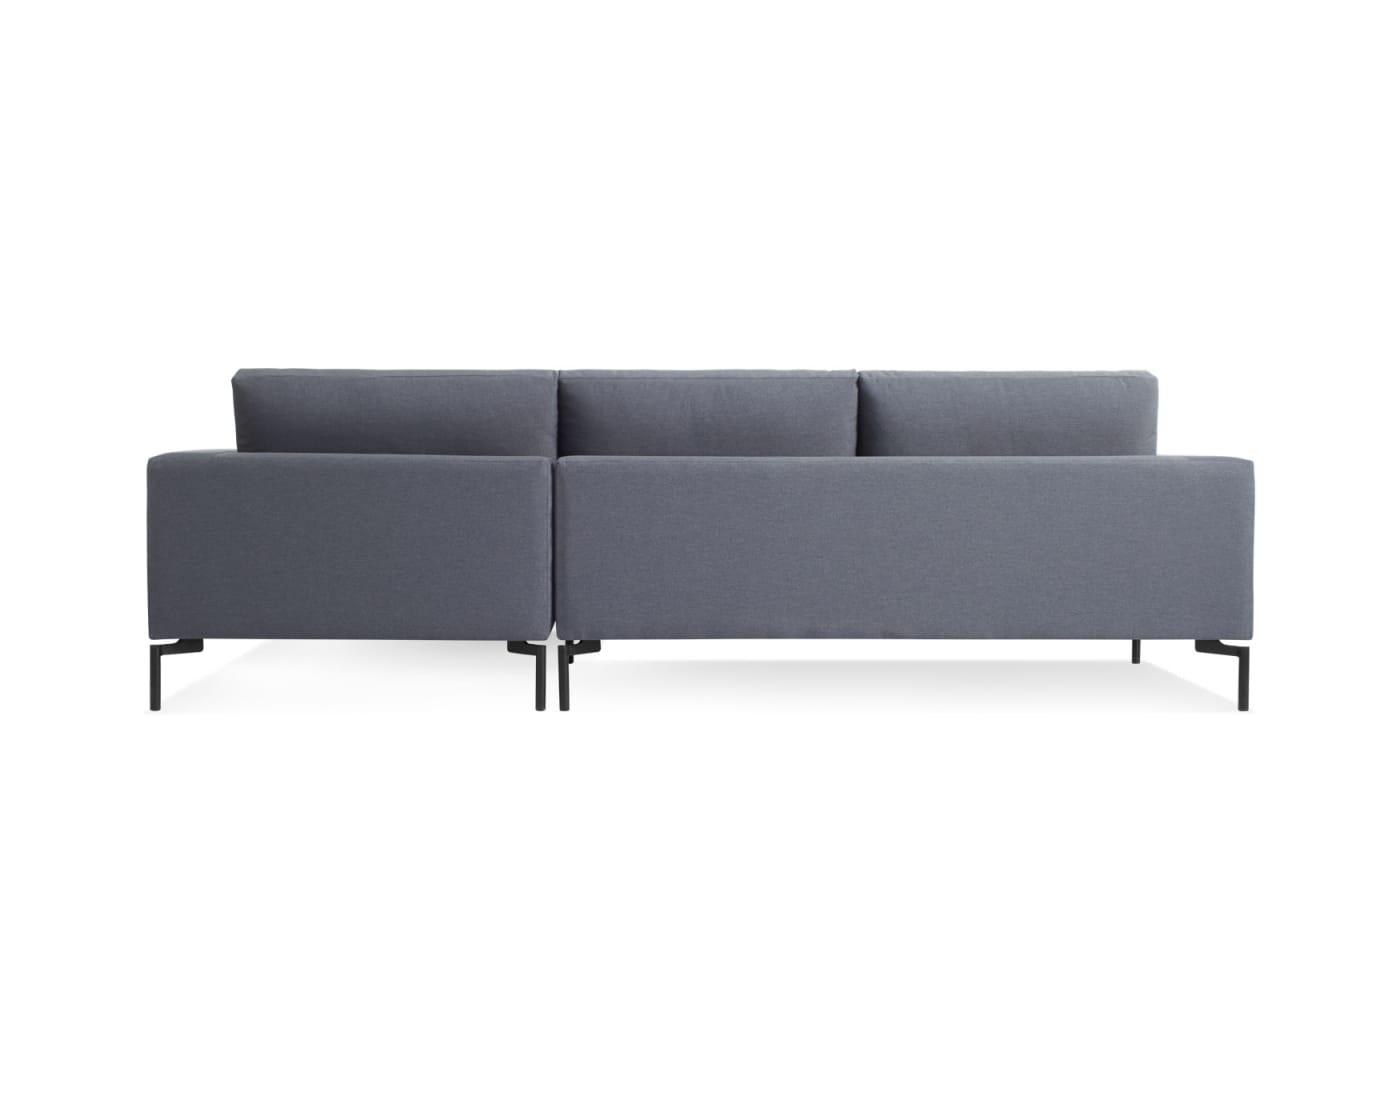 New Standard Sofa W/ Left Arm Chaise intérieur Chaise But